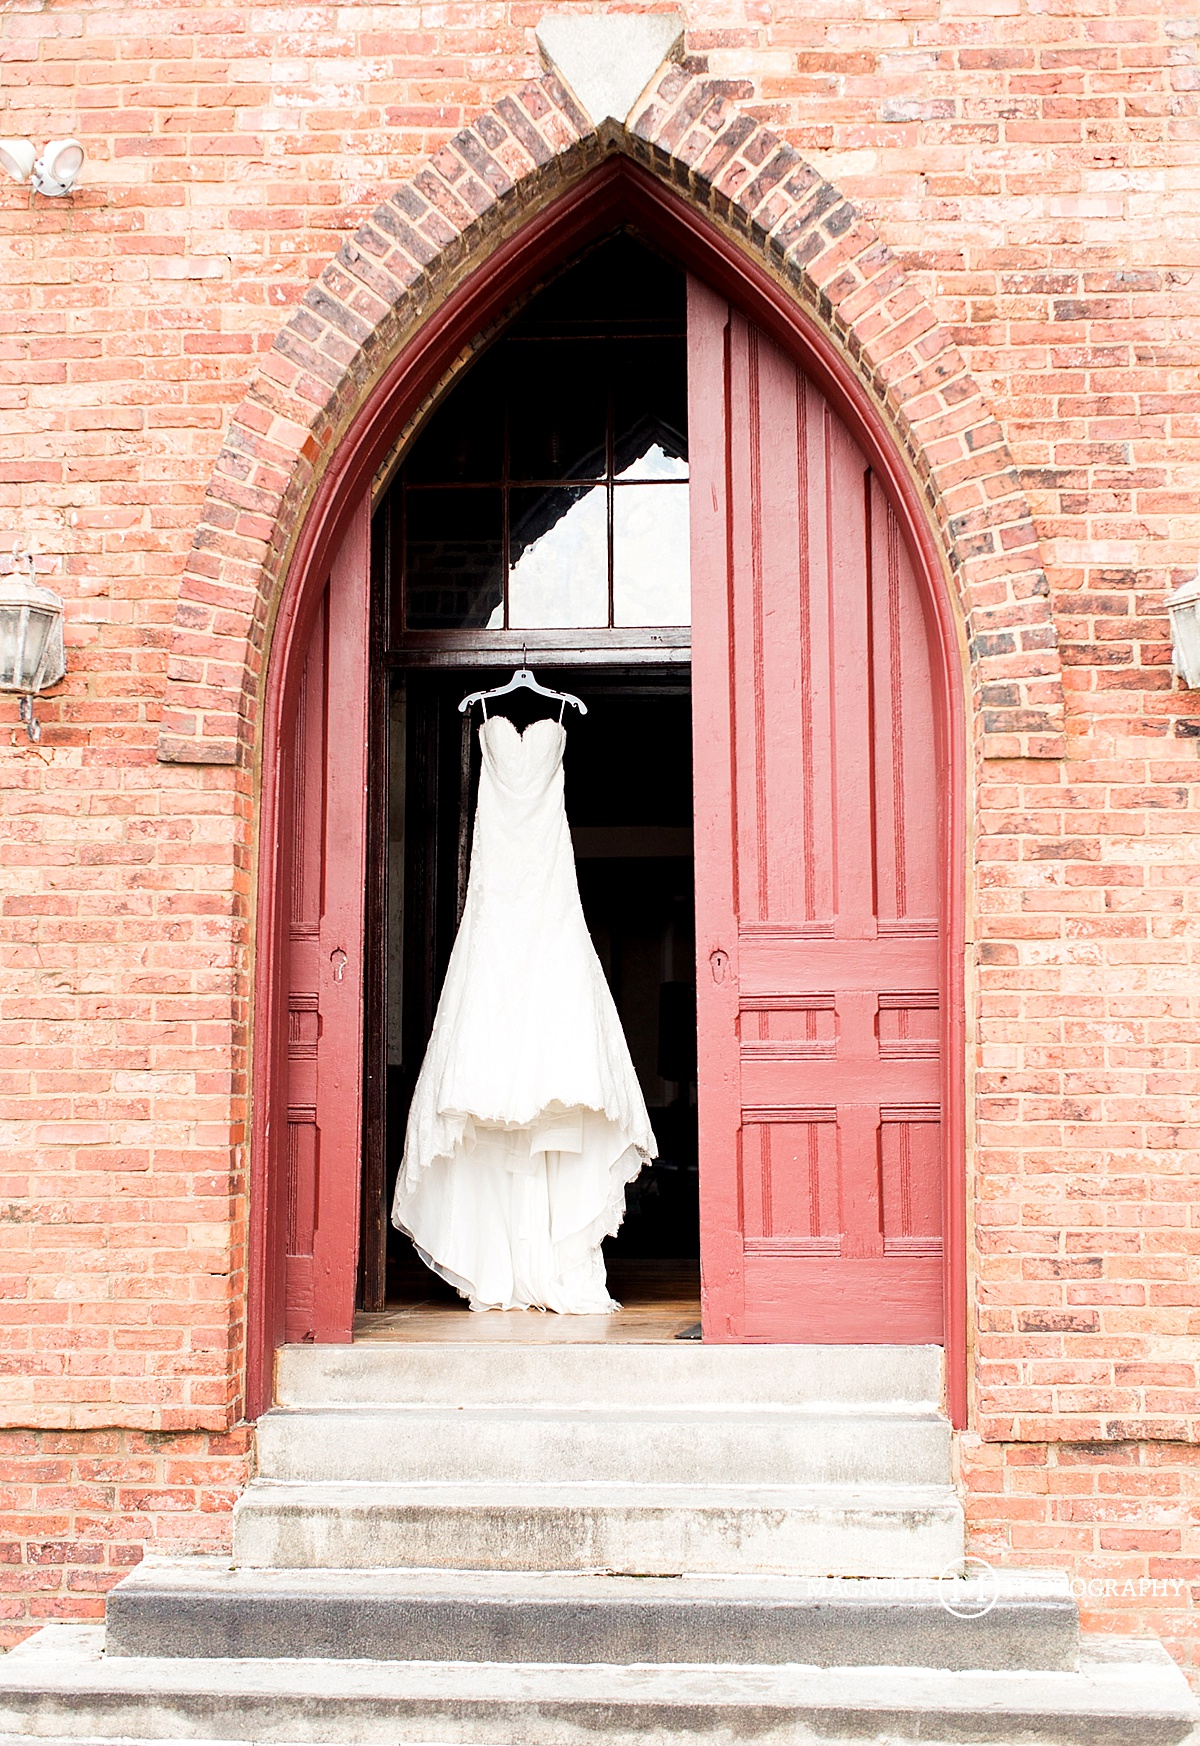 weddings at brooklyn arts center-1-1